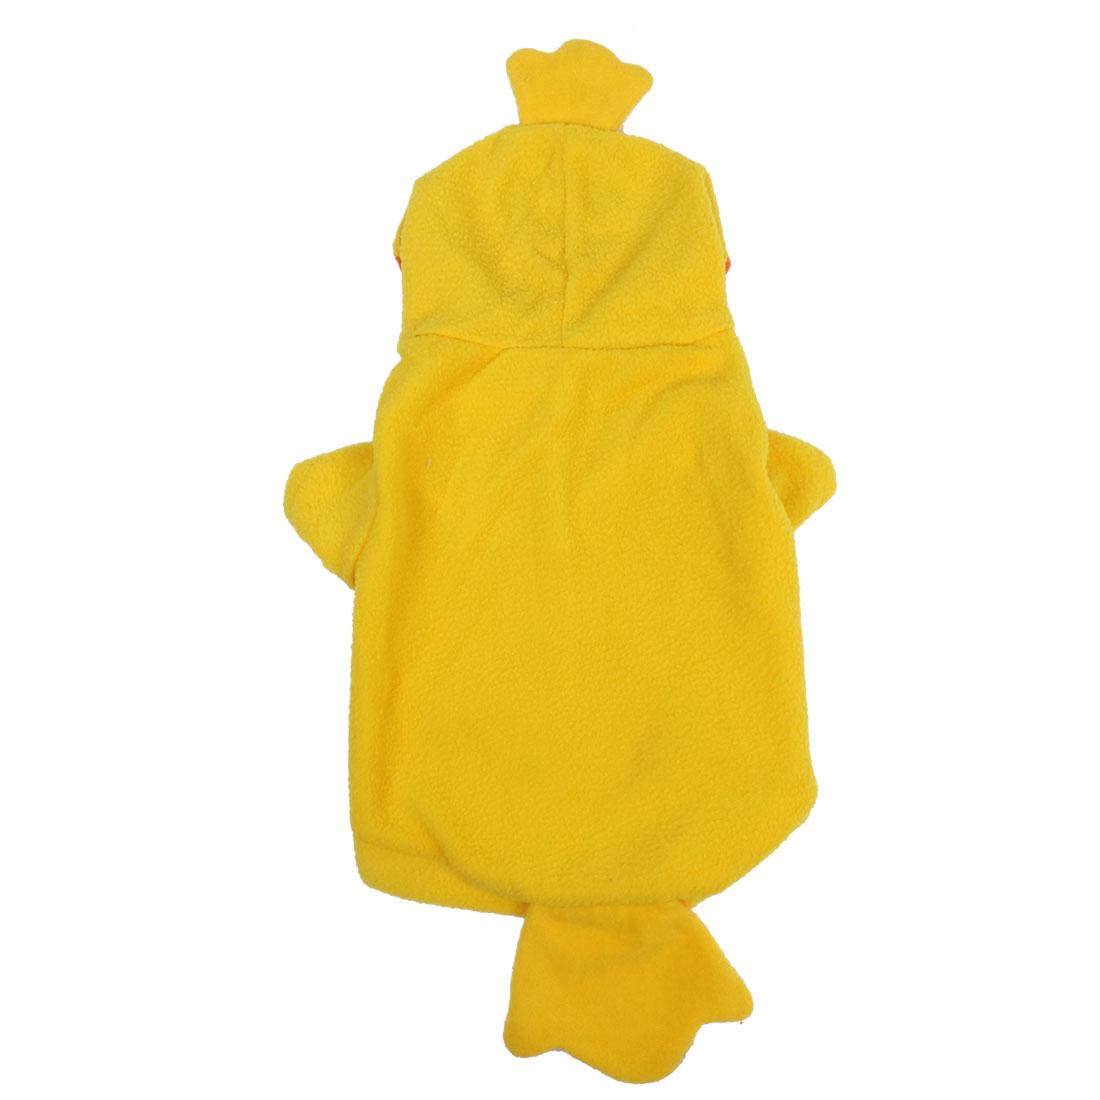 Winter Pet Cat Puppy Duck Shape Hat Apparel Costume Hoodie Coat Yellow Size L